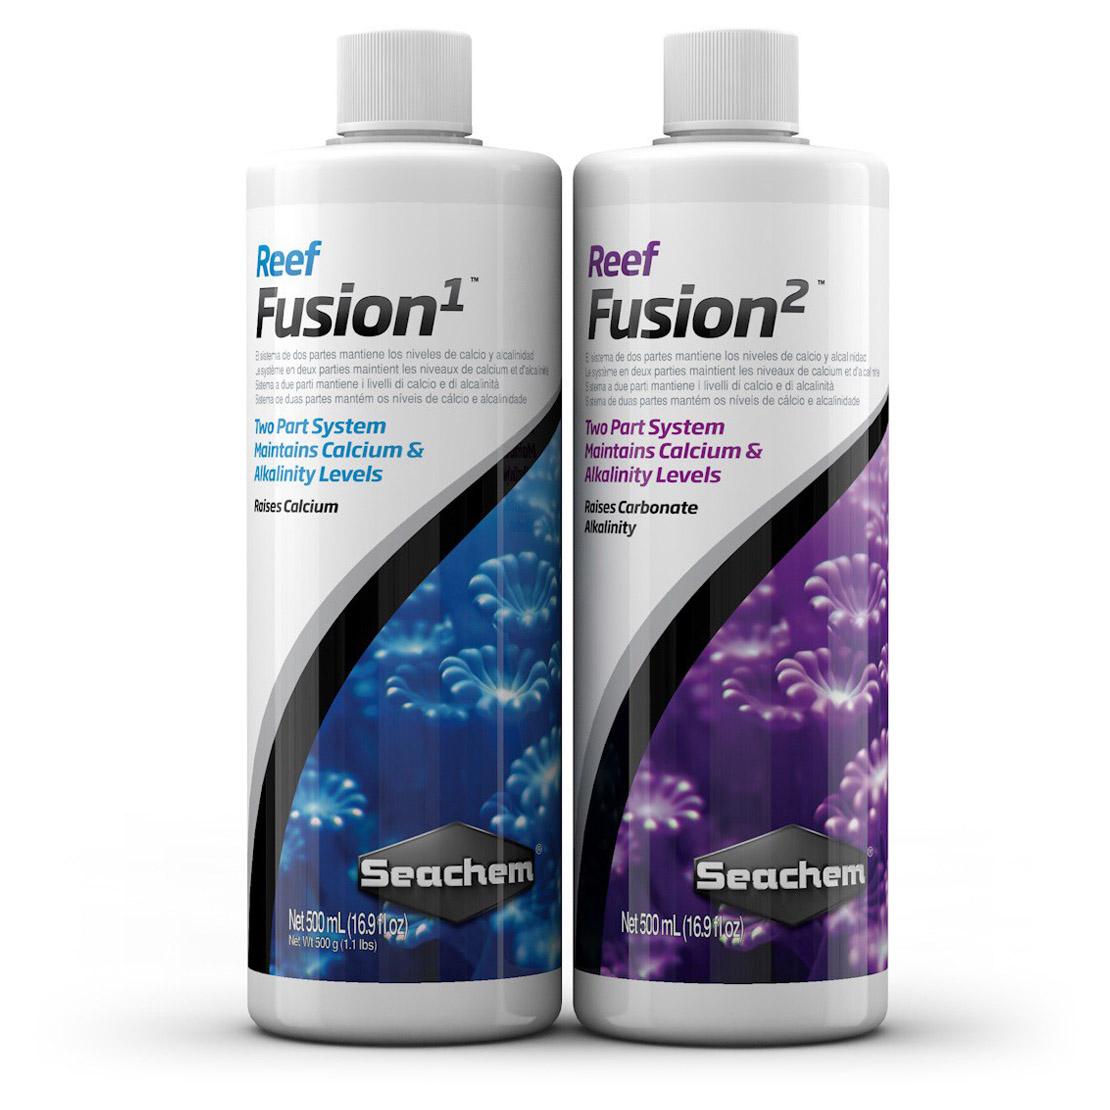 reef-fusion.jpg